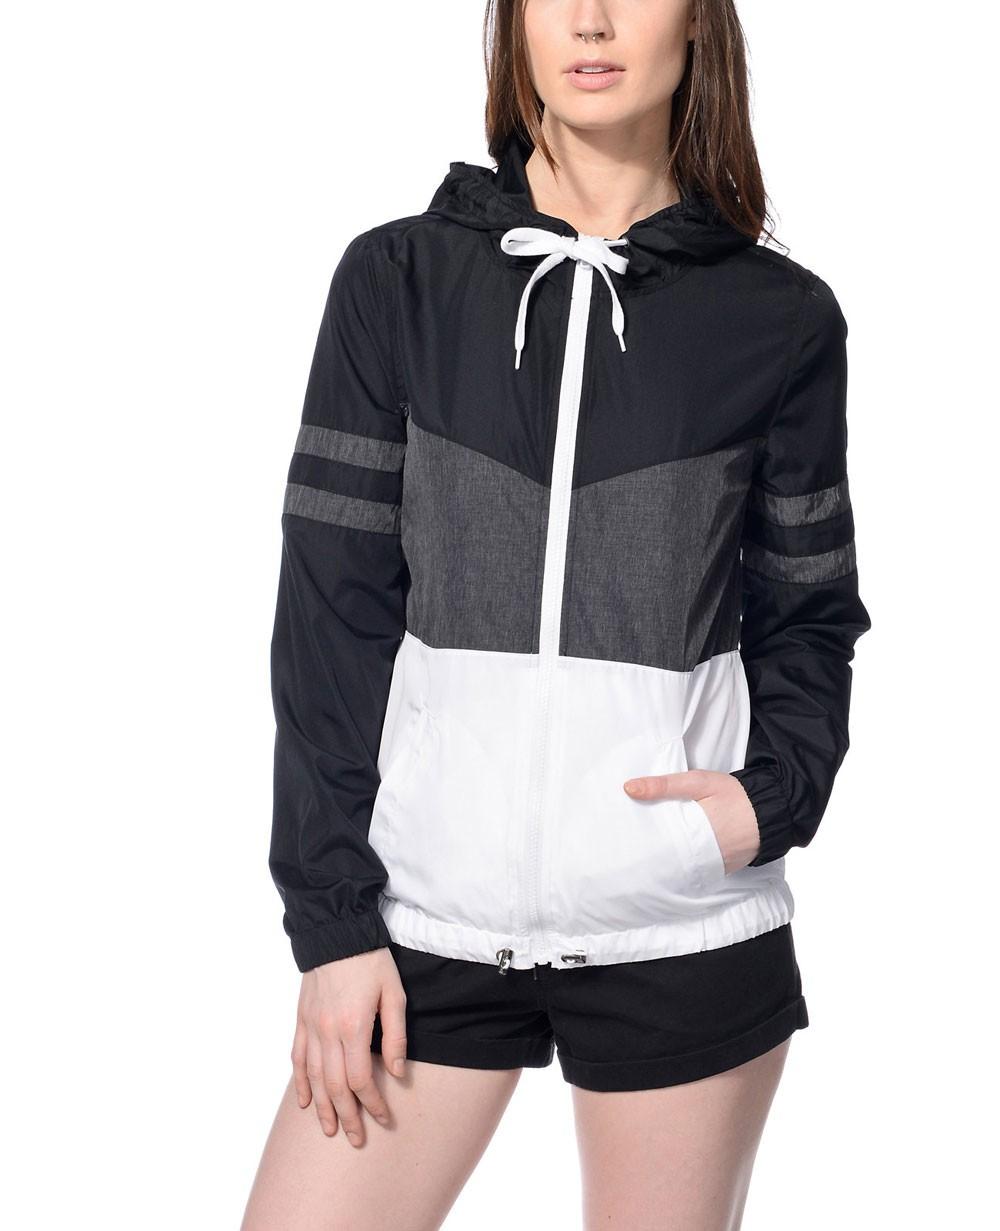 Women Pullover Black Grey   White Color Block Windbreaker Jacket 7cd15f832